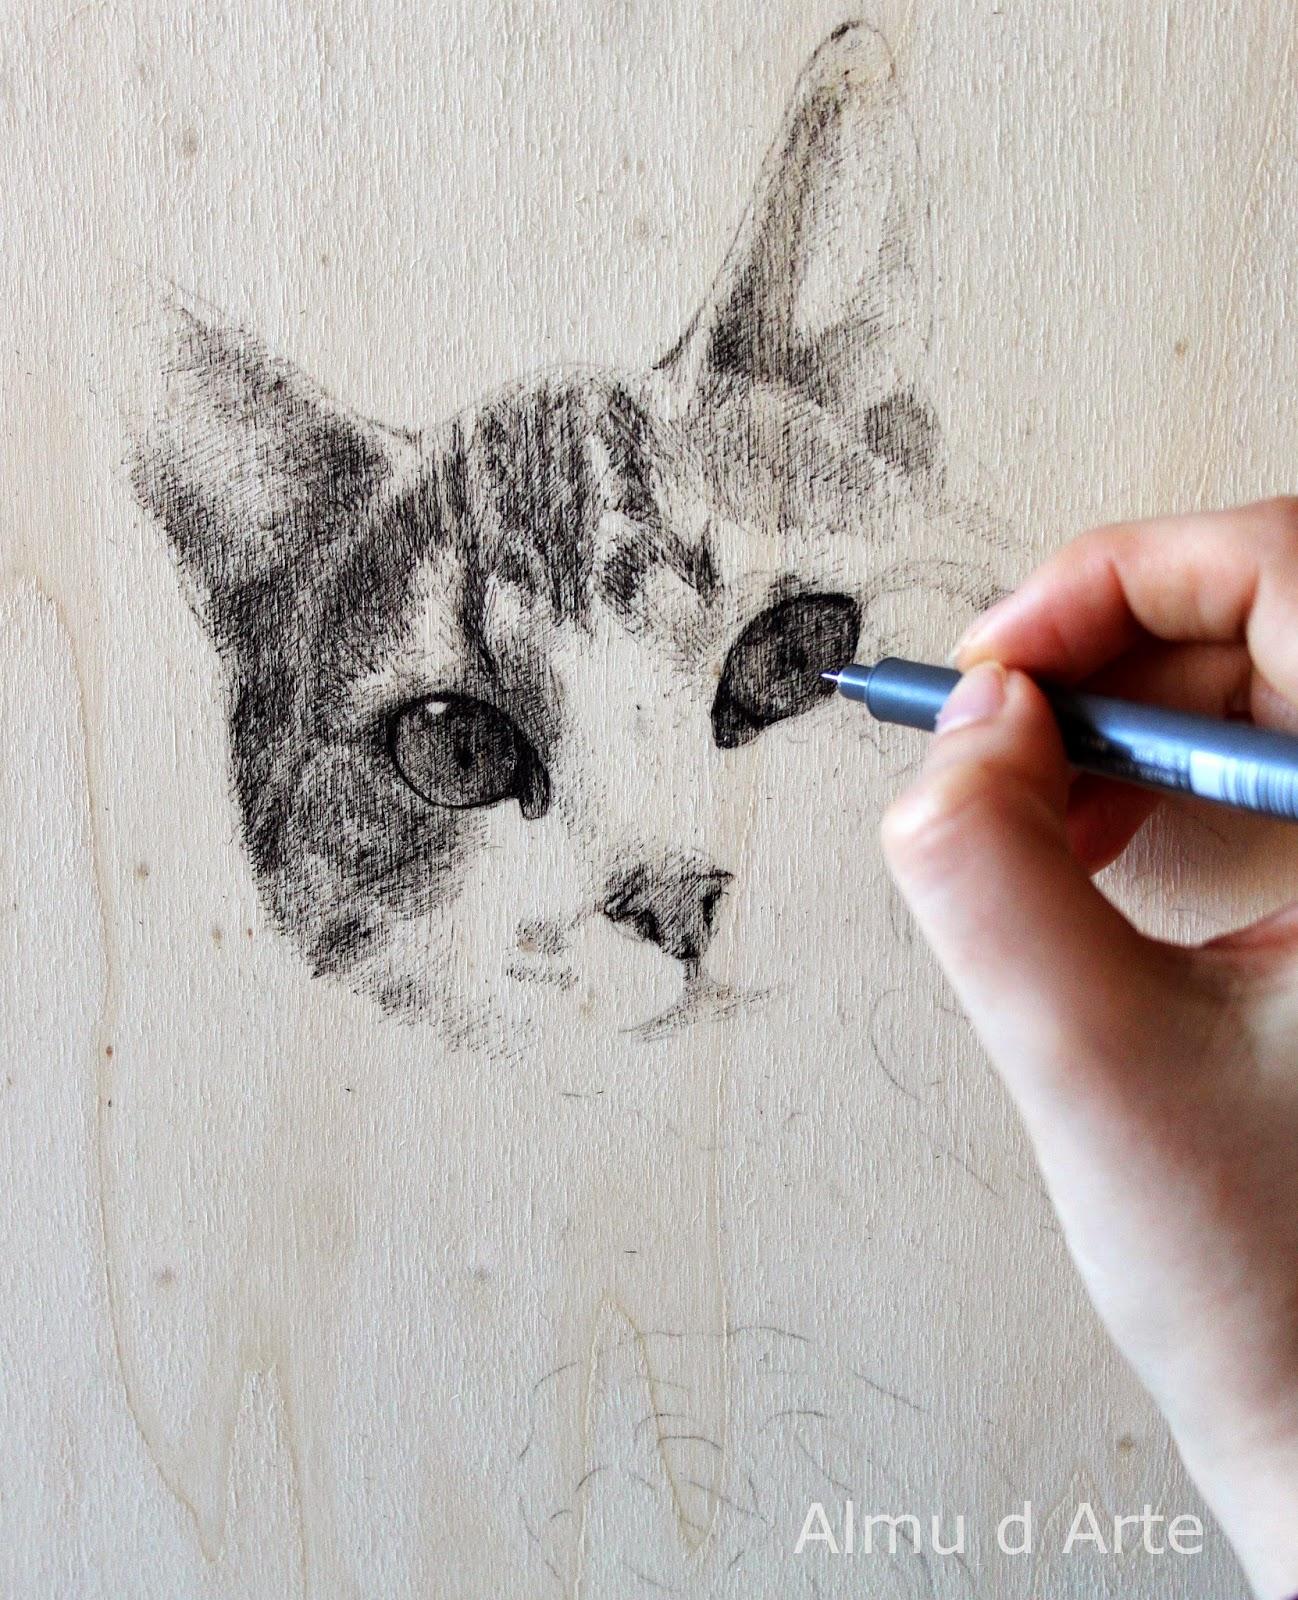 Hacer un dibujo de un gato a tinta